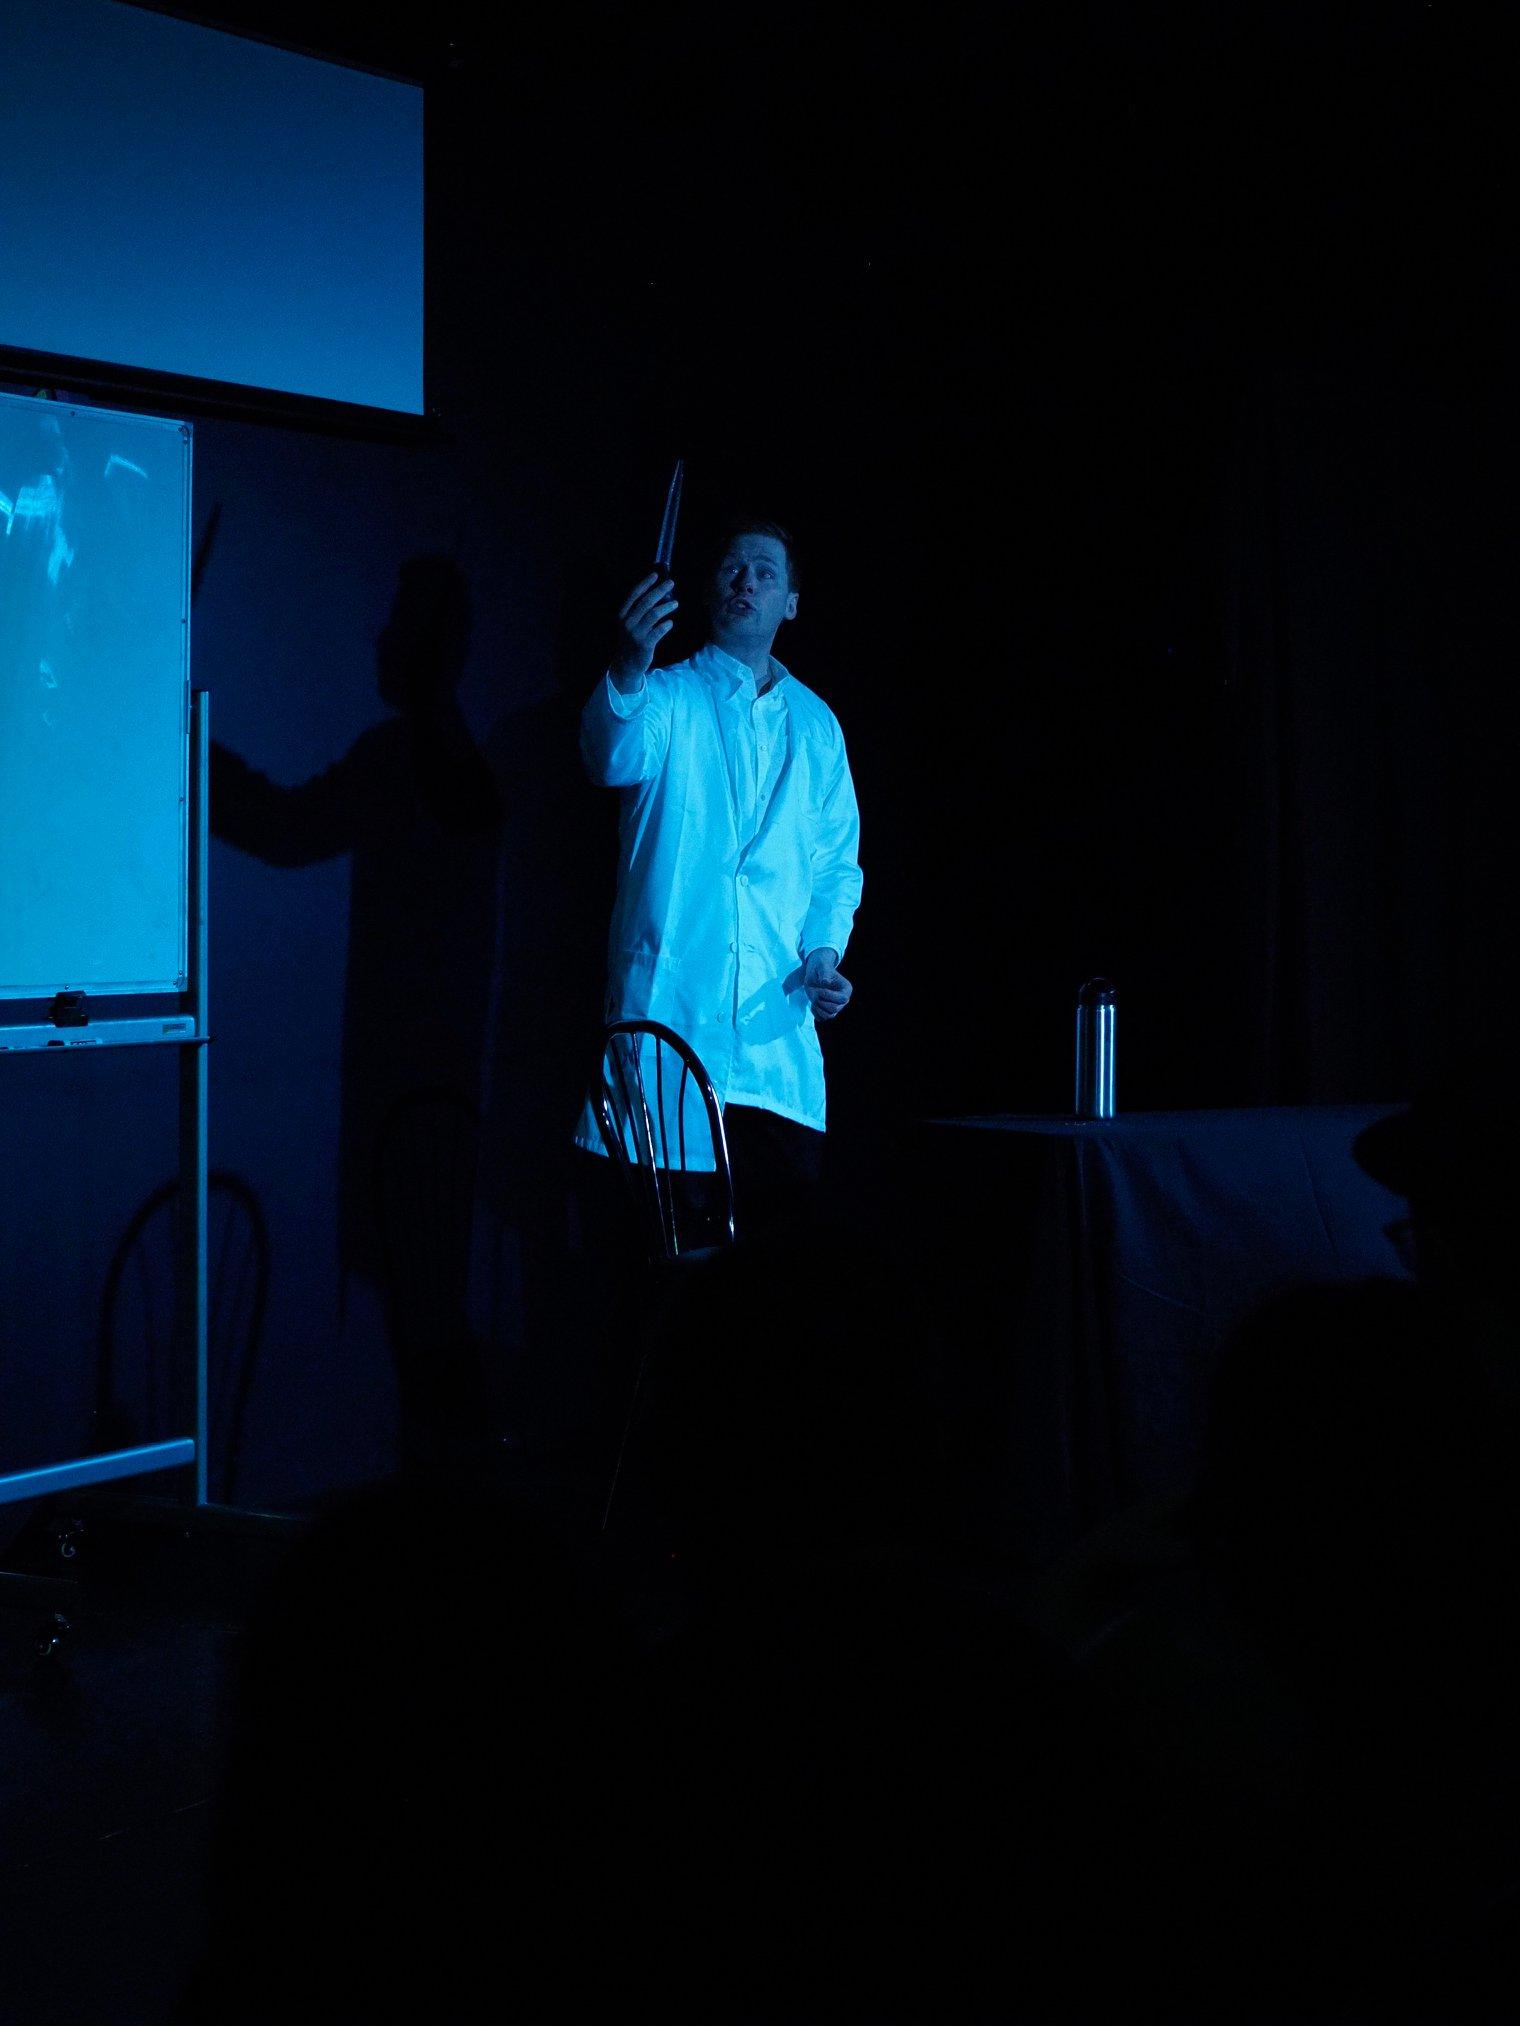 Jerome as Dr. Jekyl (📸️ Photo by Bob Shields)